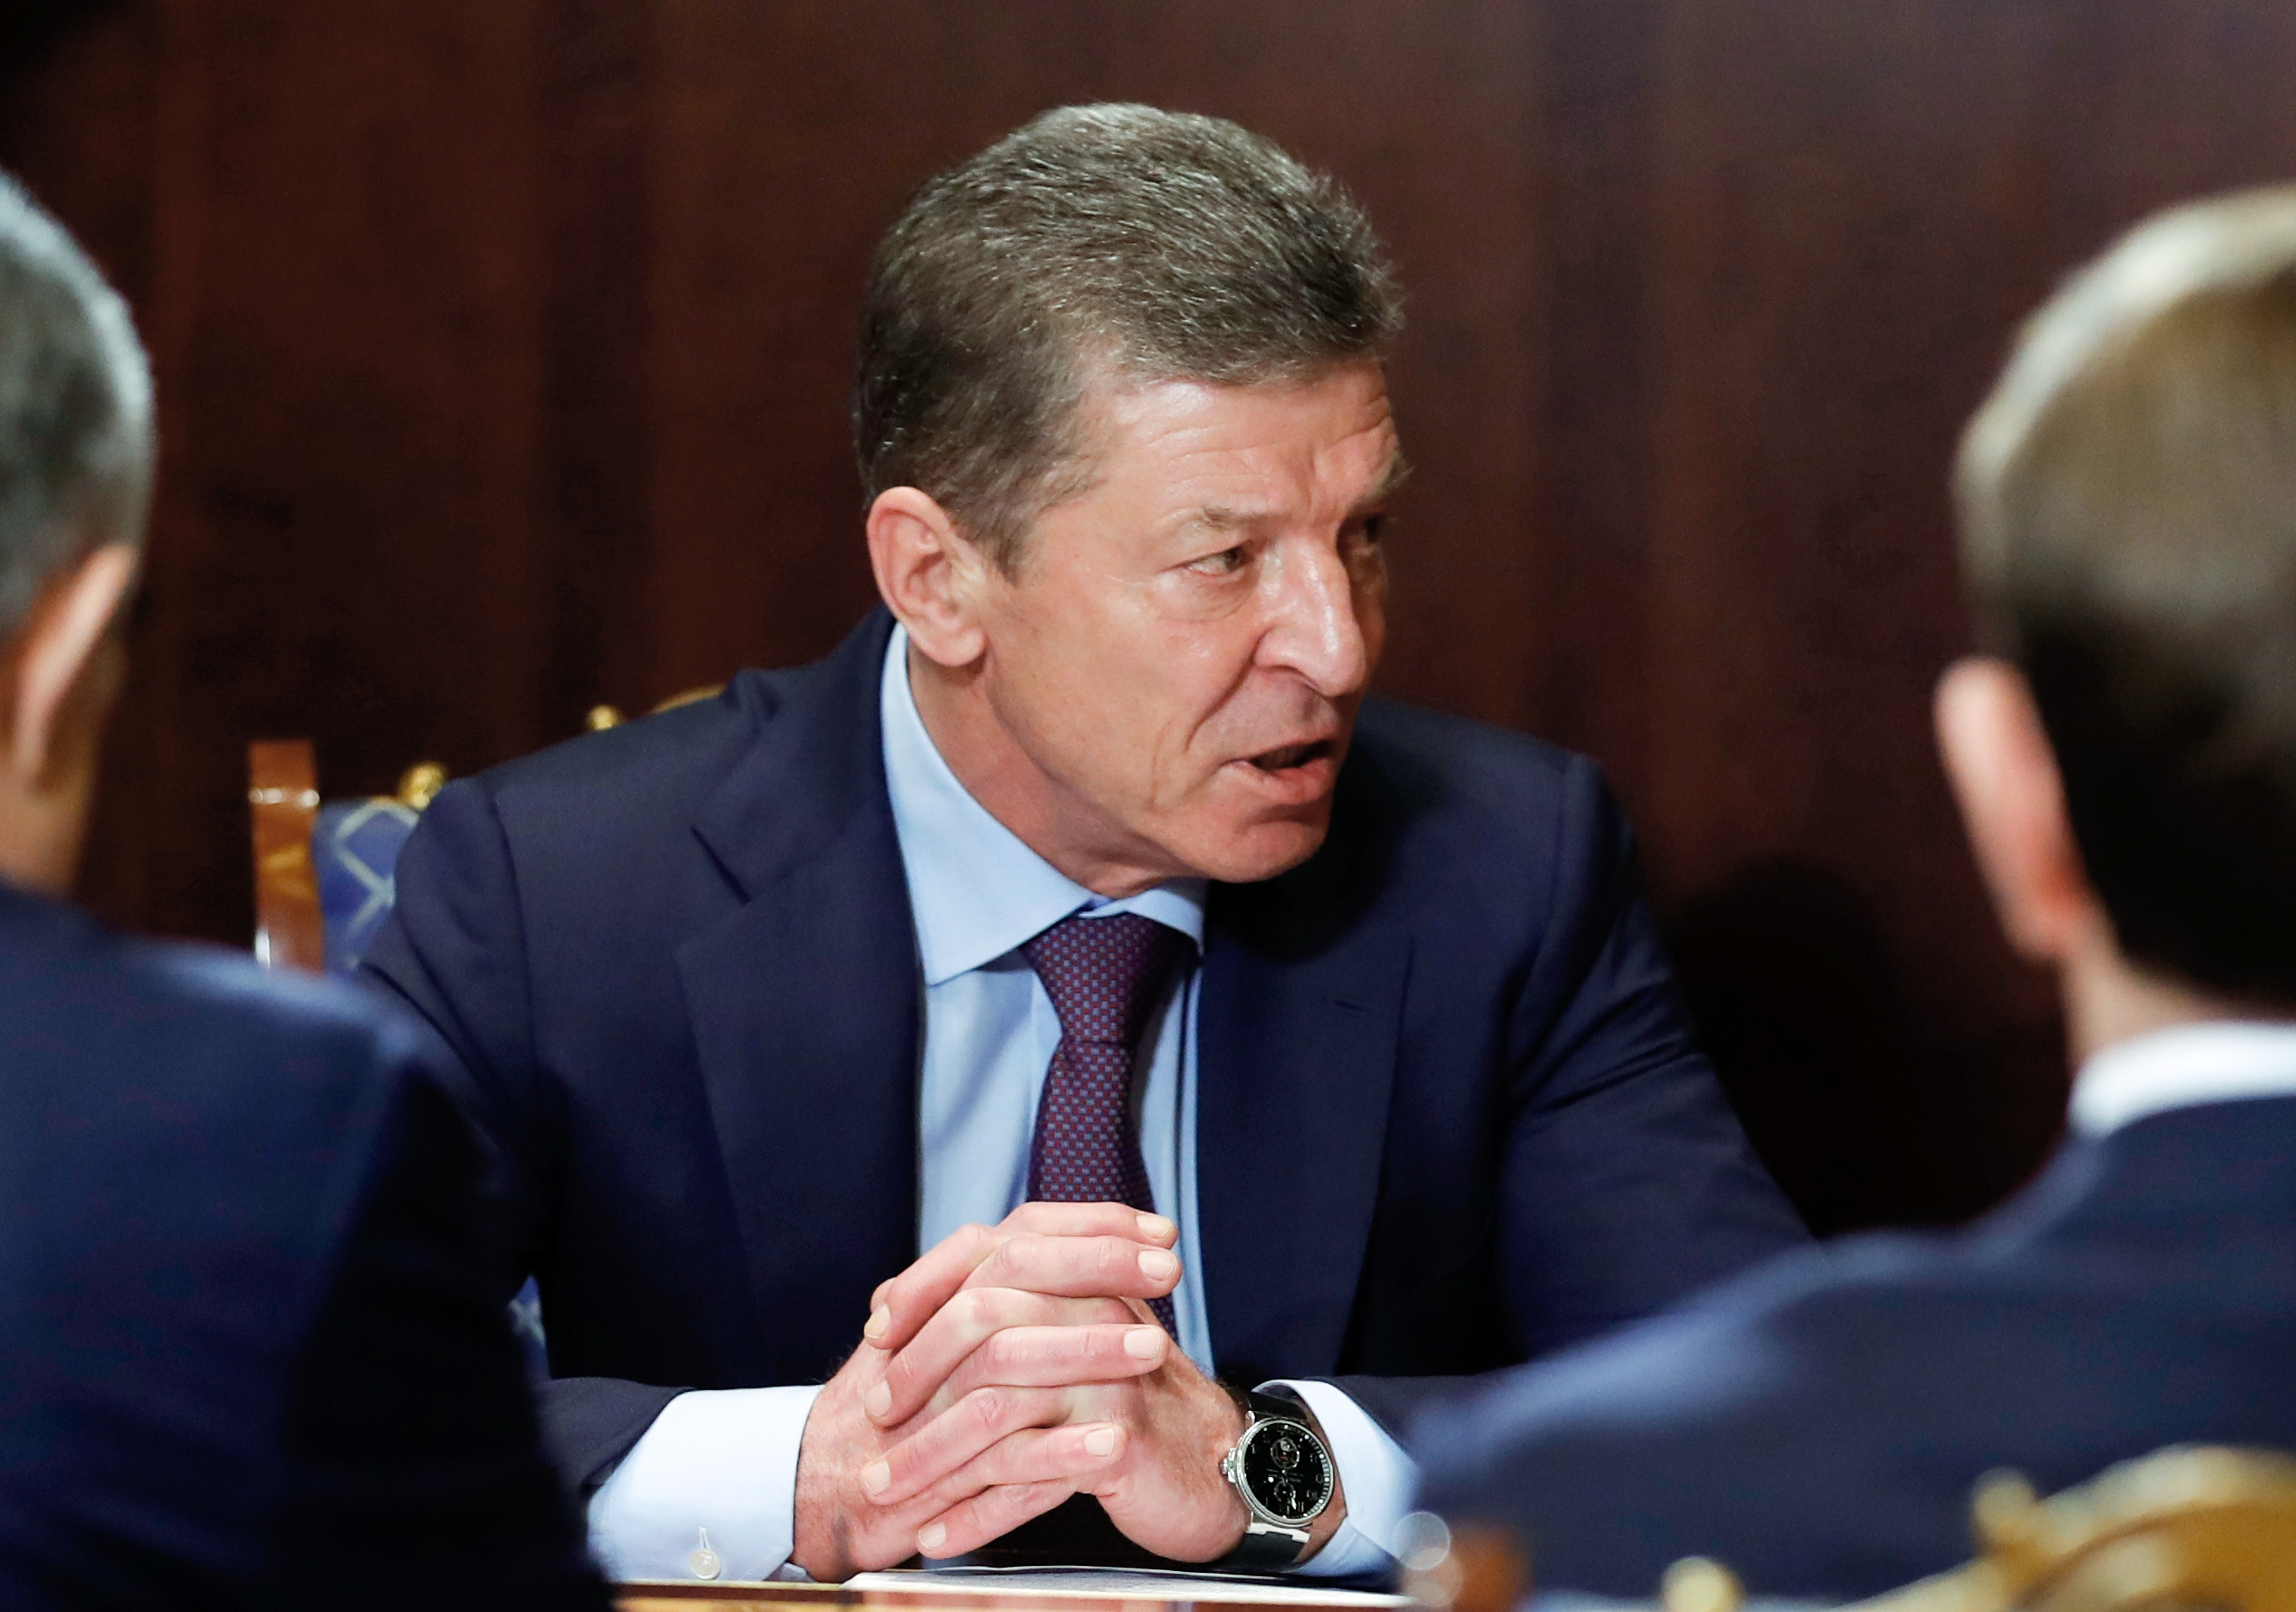 Прекращения огня на Донбассе, Украина и судьба «Минска»